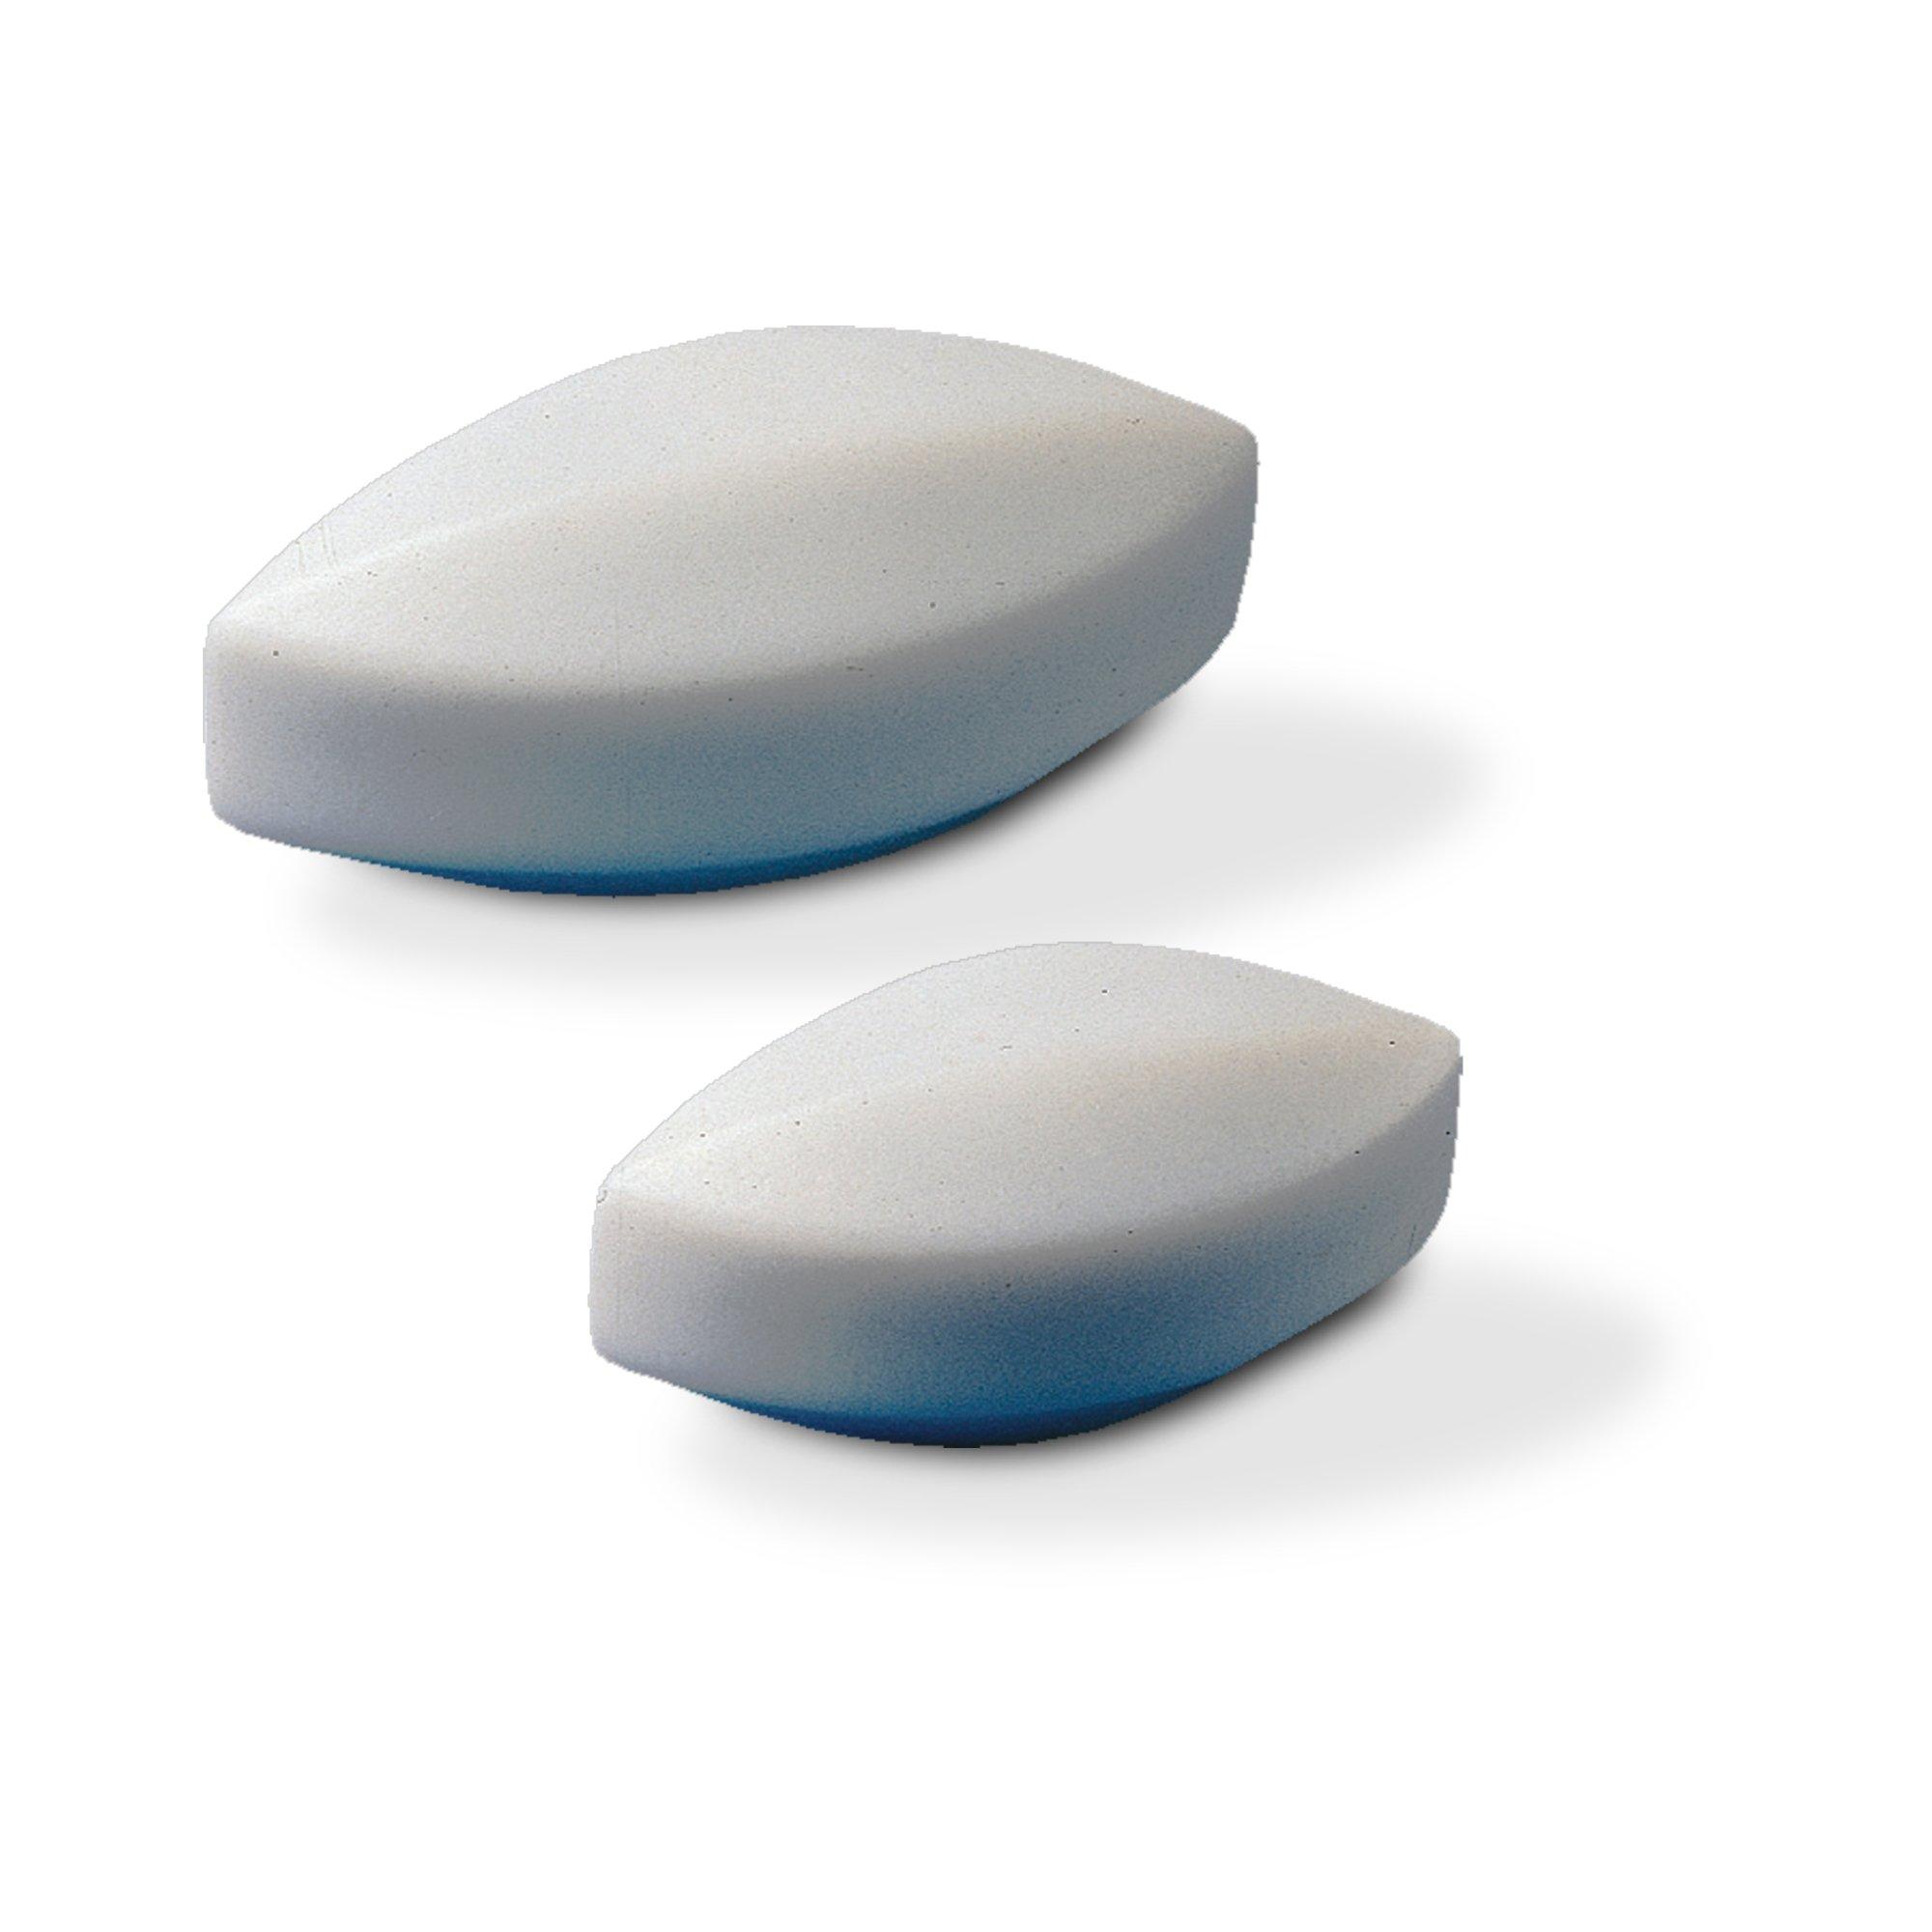 Bel-Art Spinbar Teflon Elliptical (Egg-Shaped) Magnetic Stirring Bar; 25.4 x 12.7mm, White (F37130-0001)